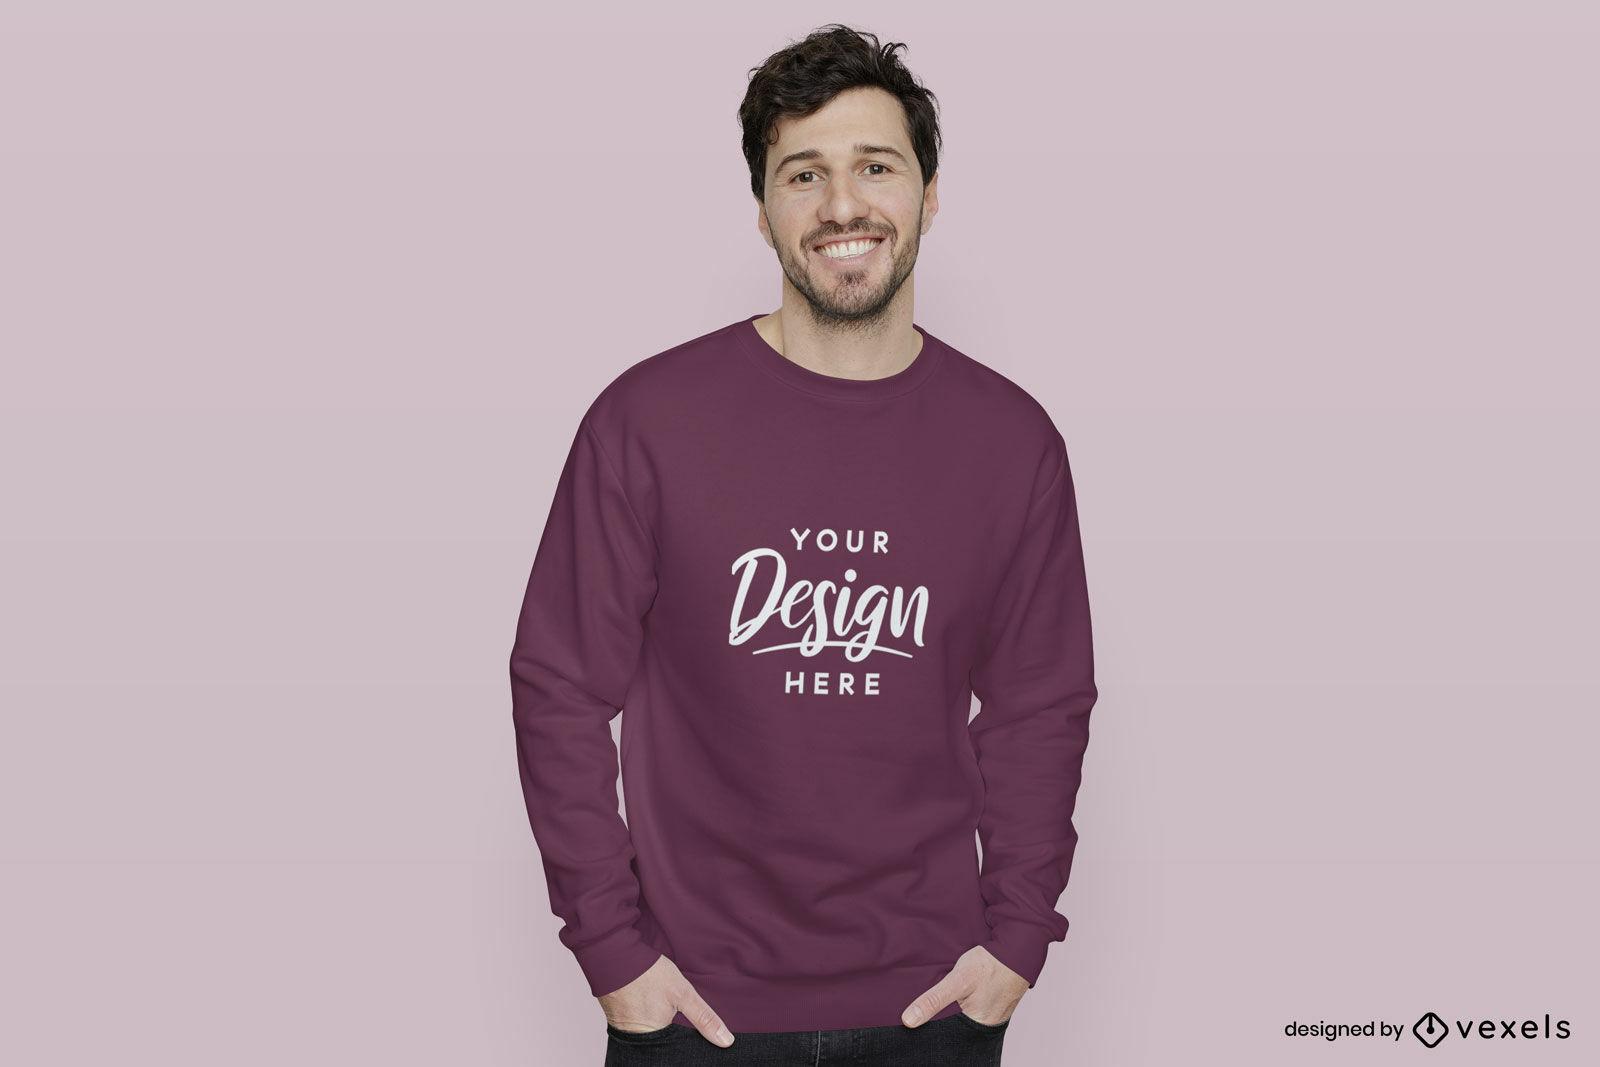 Dunkelvioletter Sweatshirtmann im rosa Hintergrundmodell